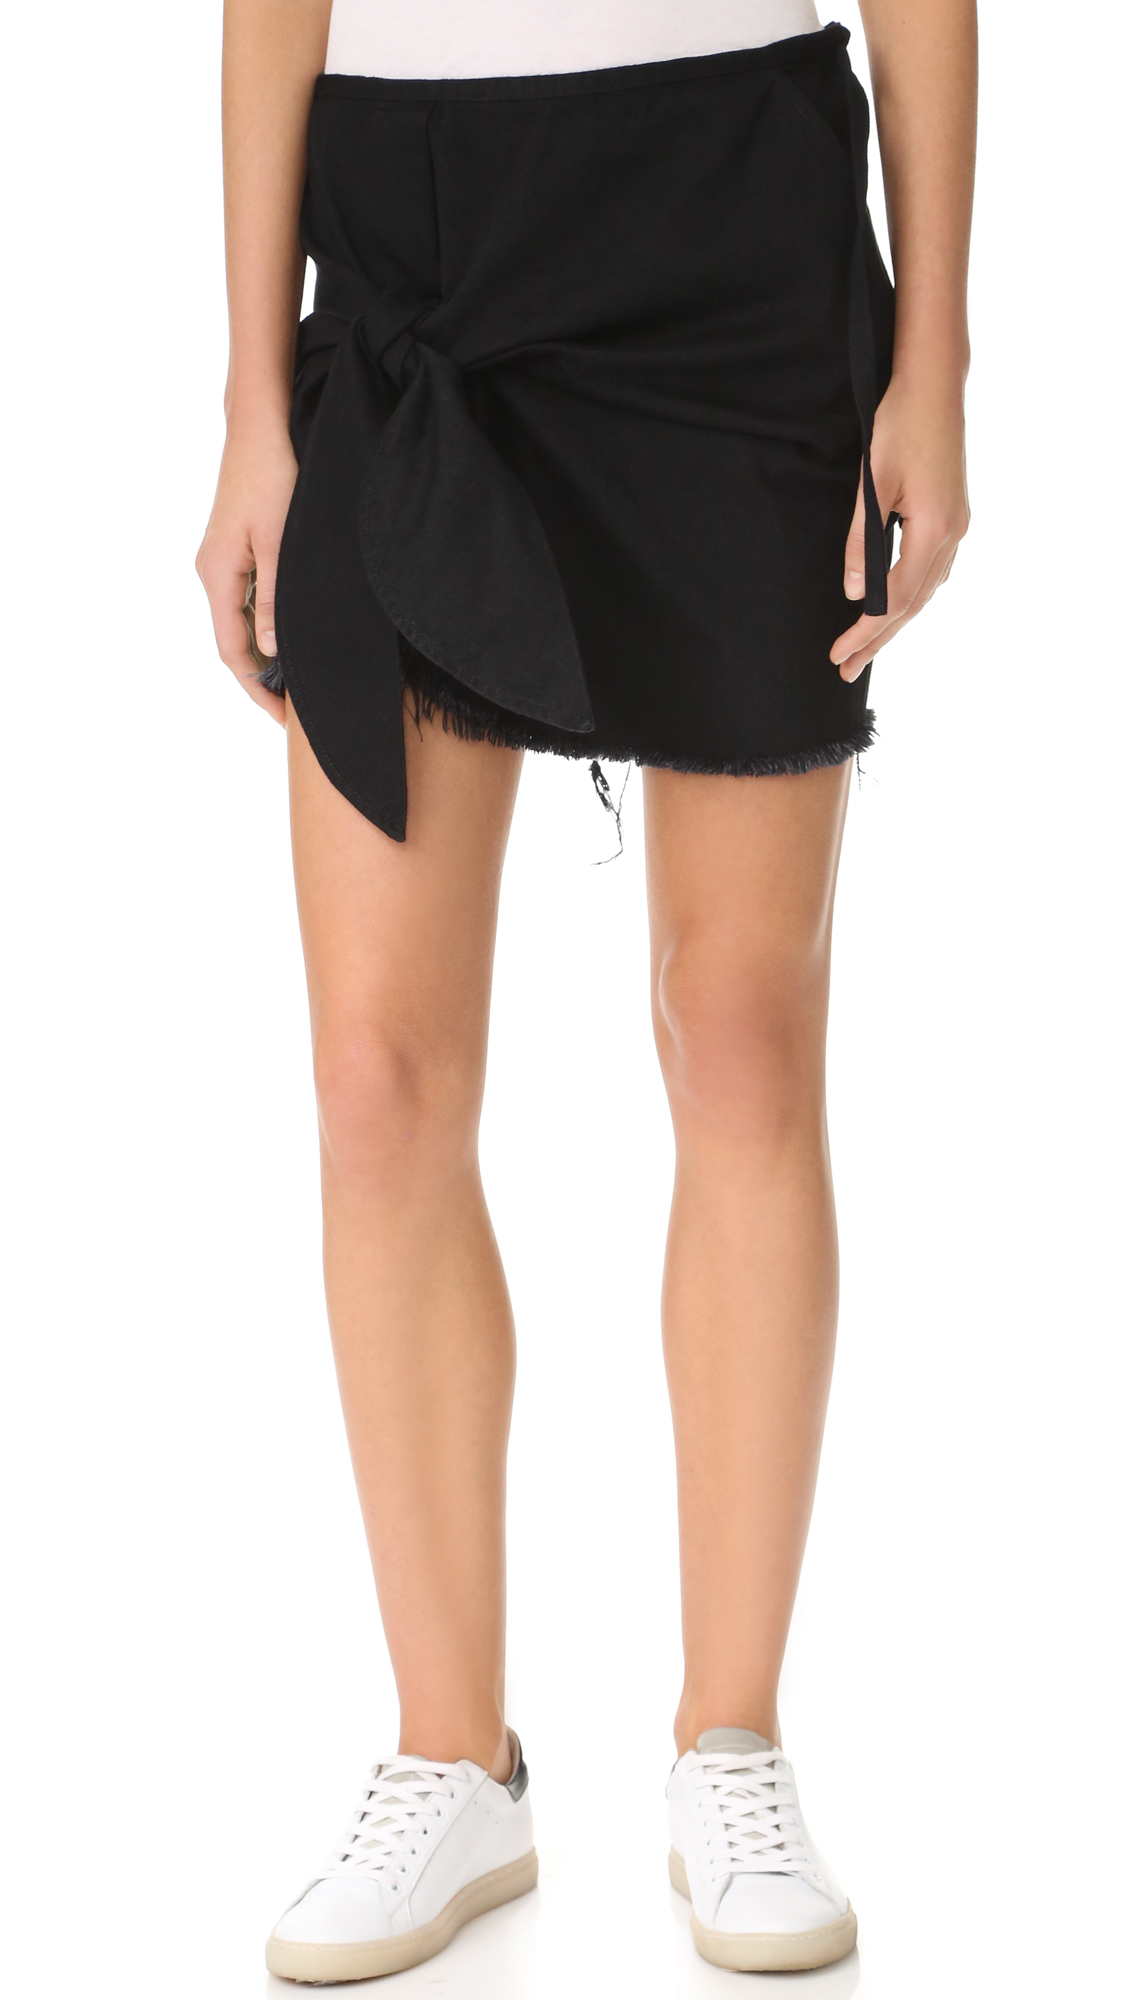 Marques Almeida Denim Knotted Mini Skirt - Black